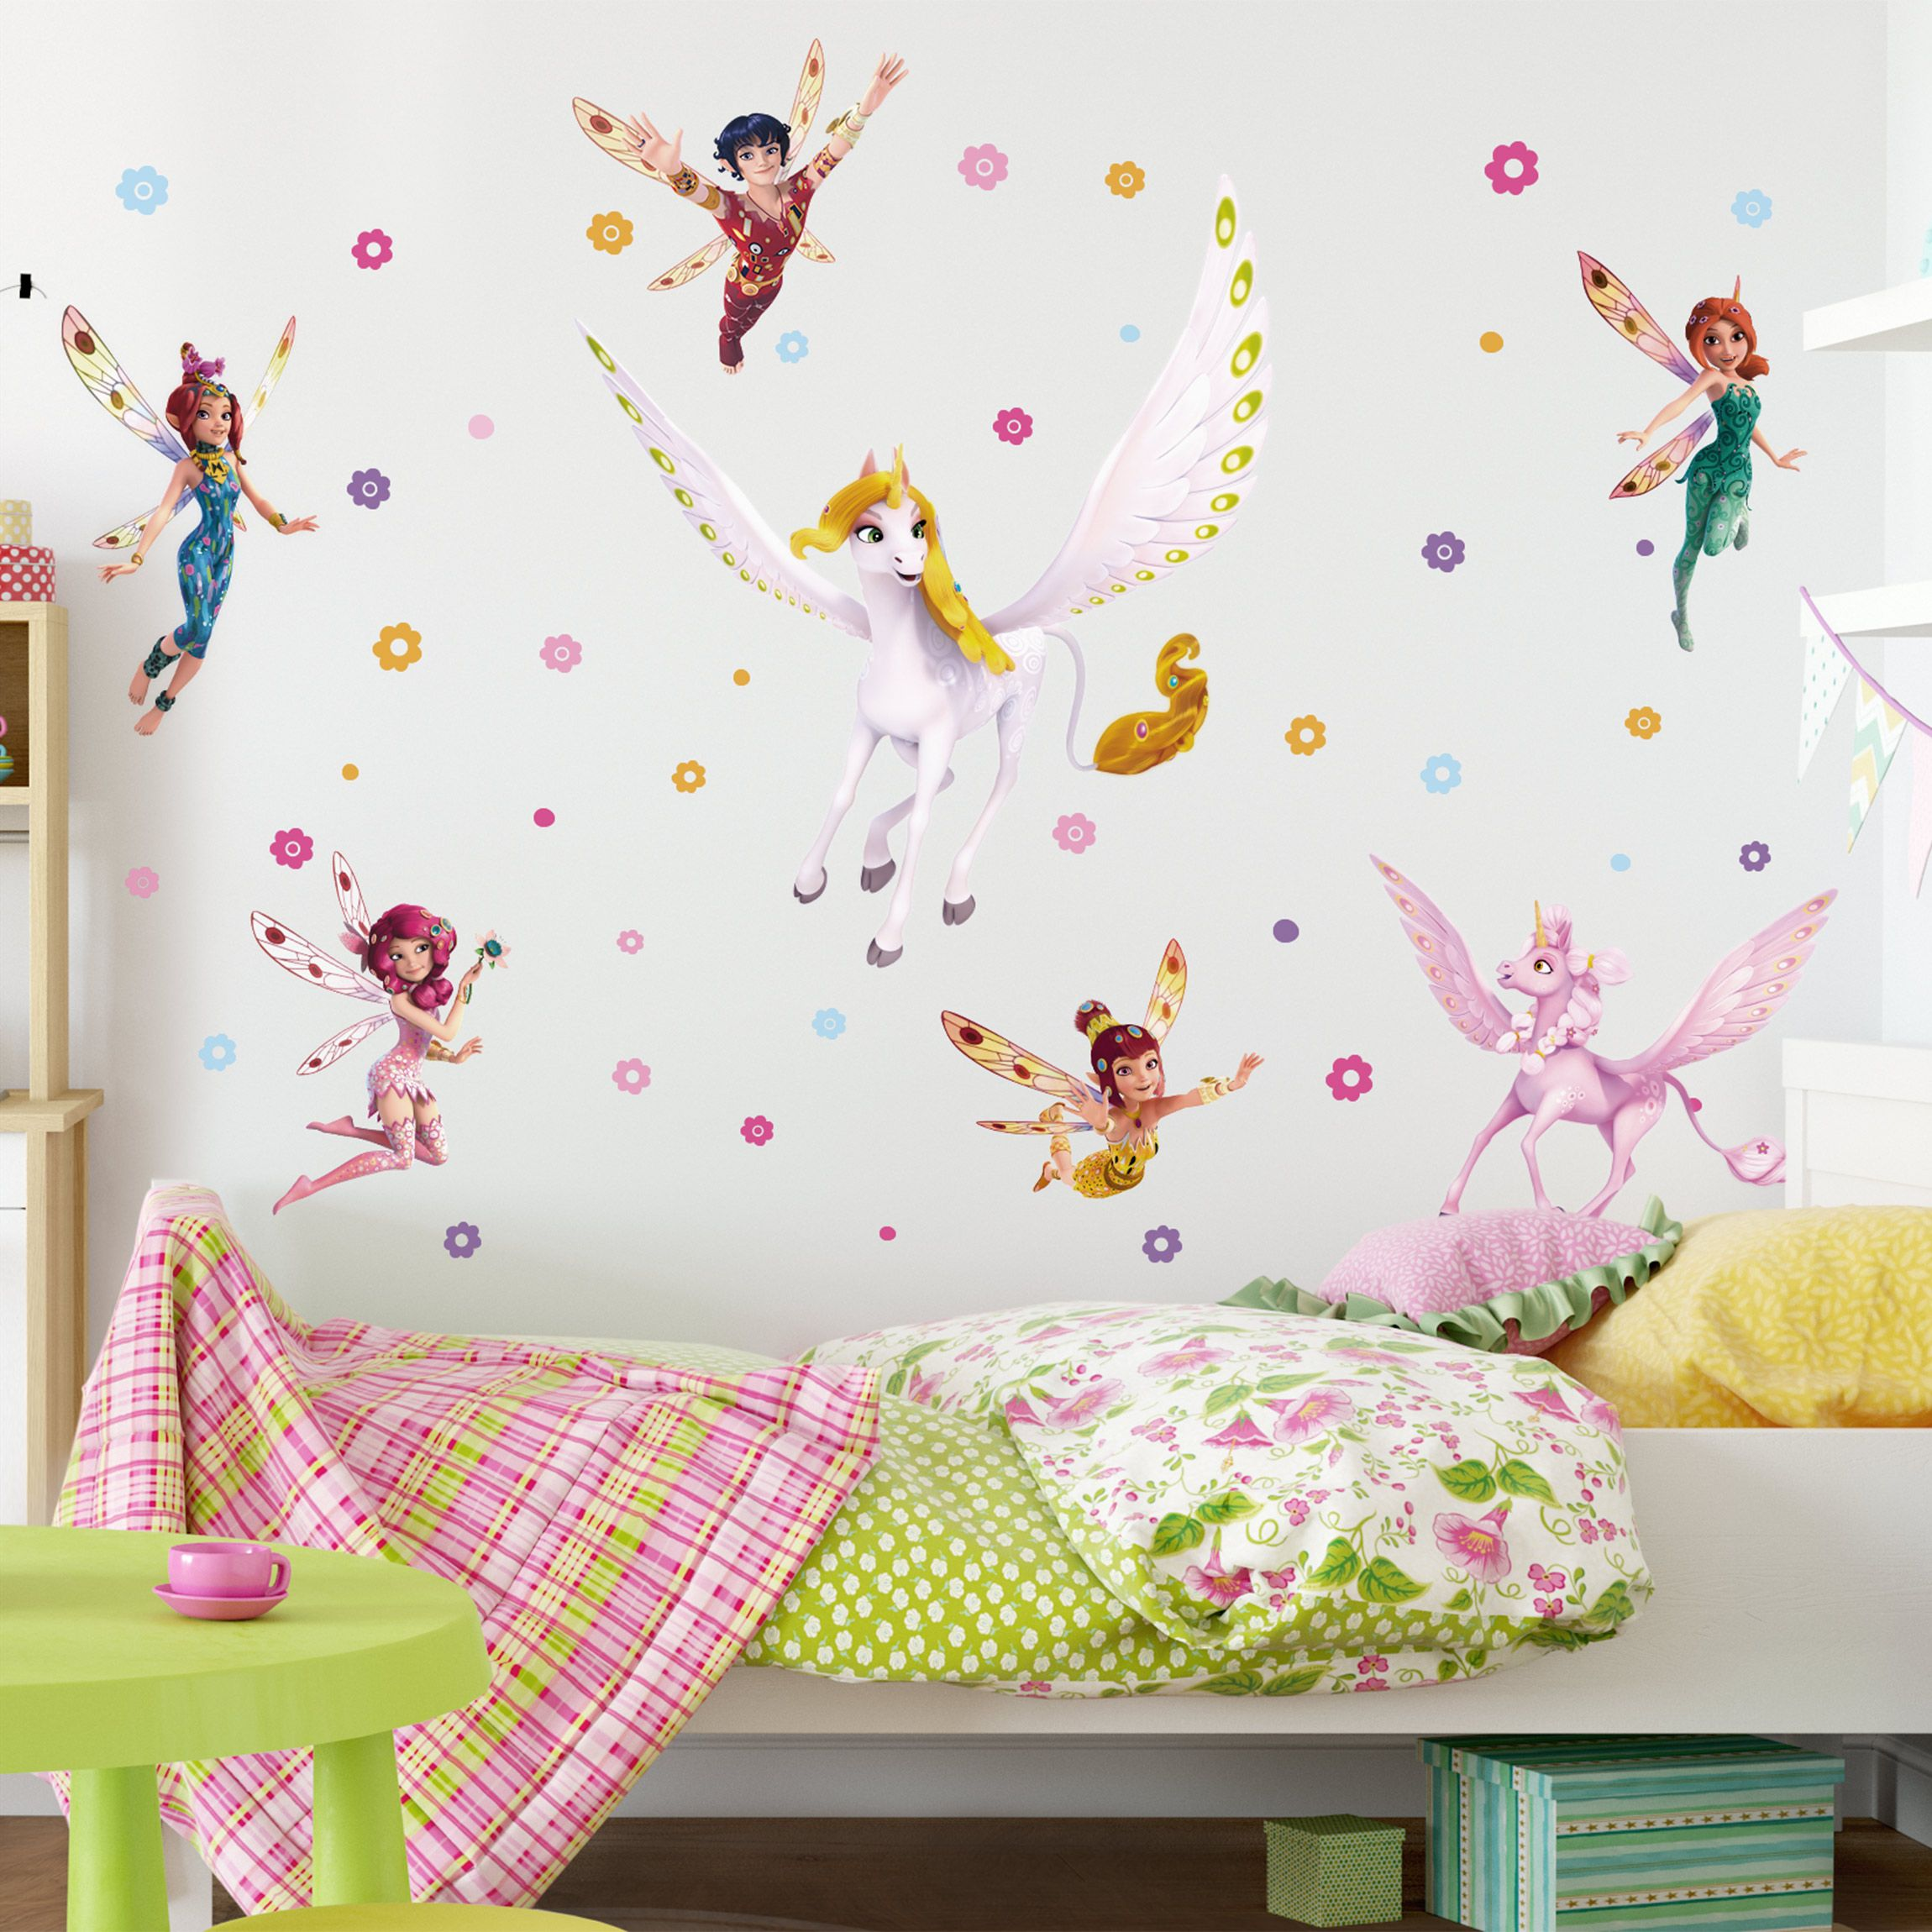 Wandtattoo Kinderzimmer Mia and Me - Sara, Onchao, Kyara mit den ...